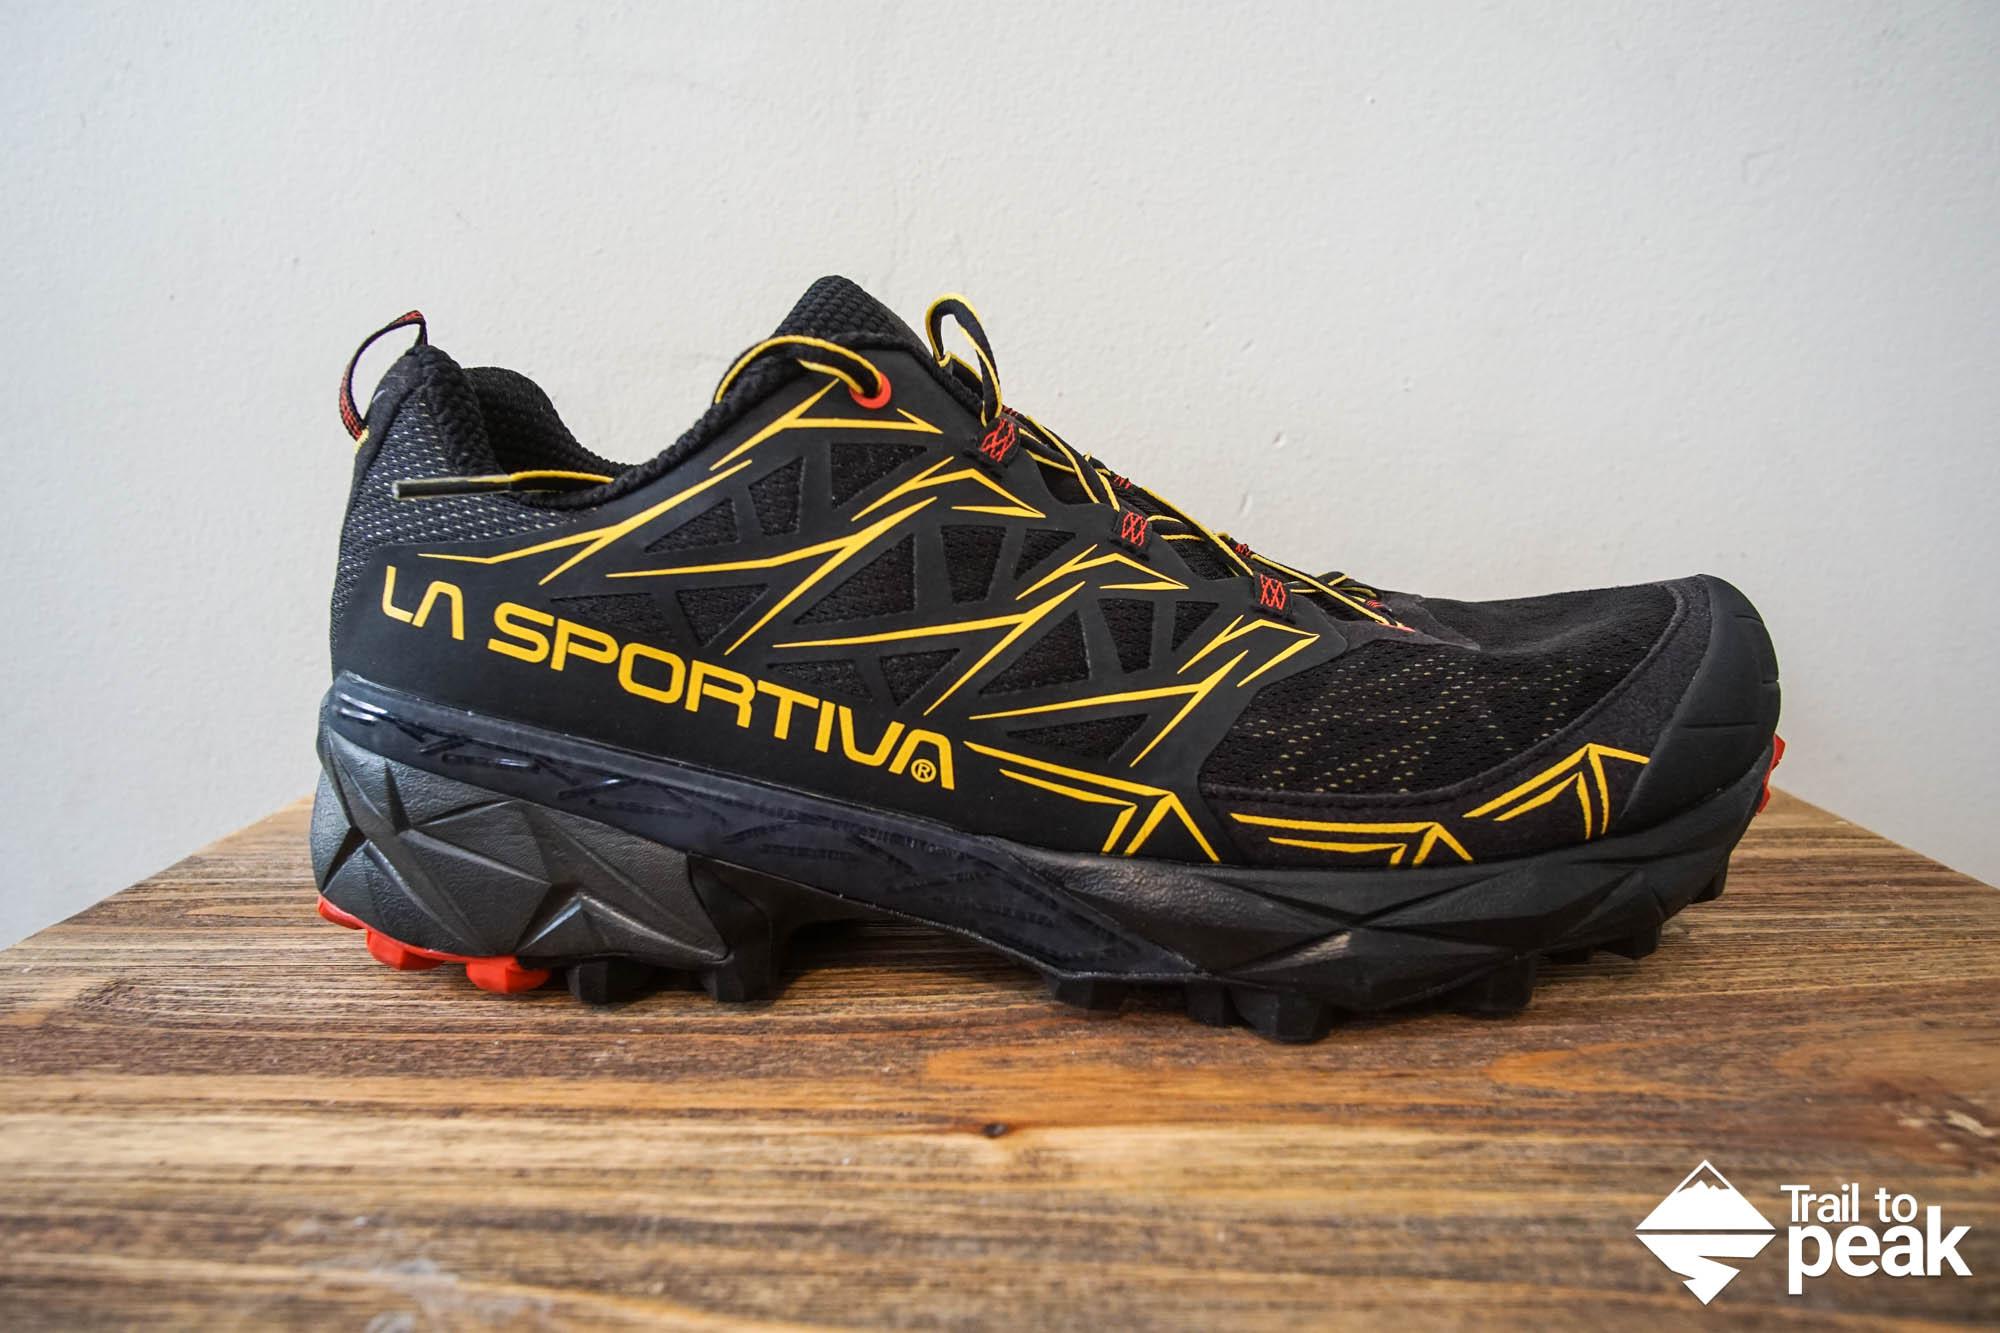 Gear Preview: La Sportiva Akyra - Trail